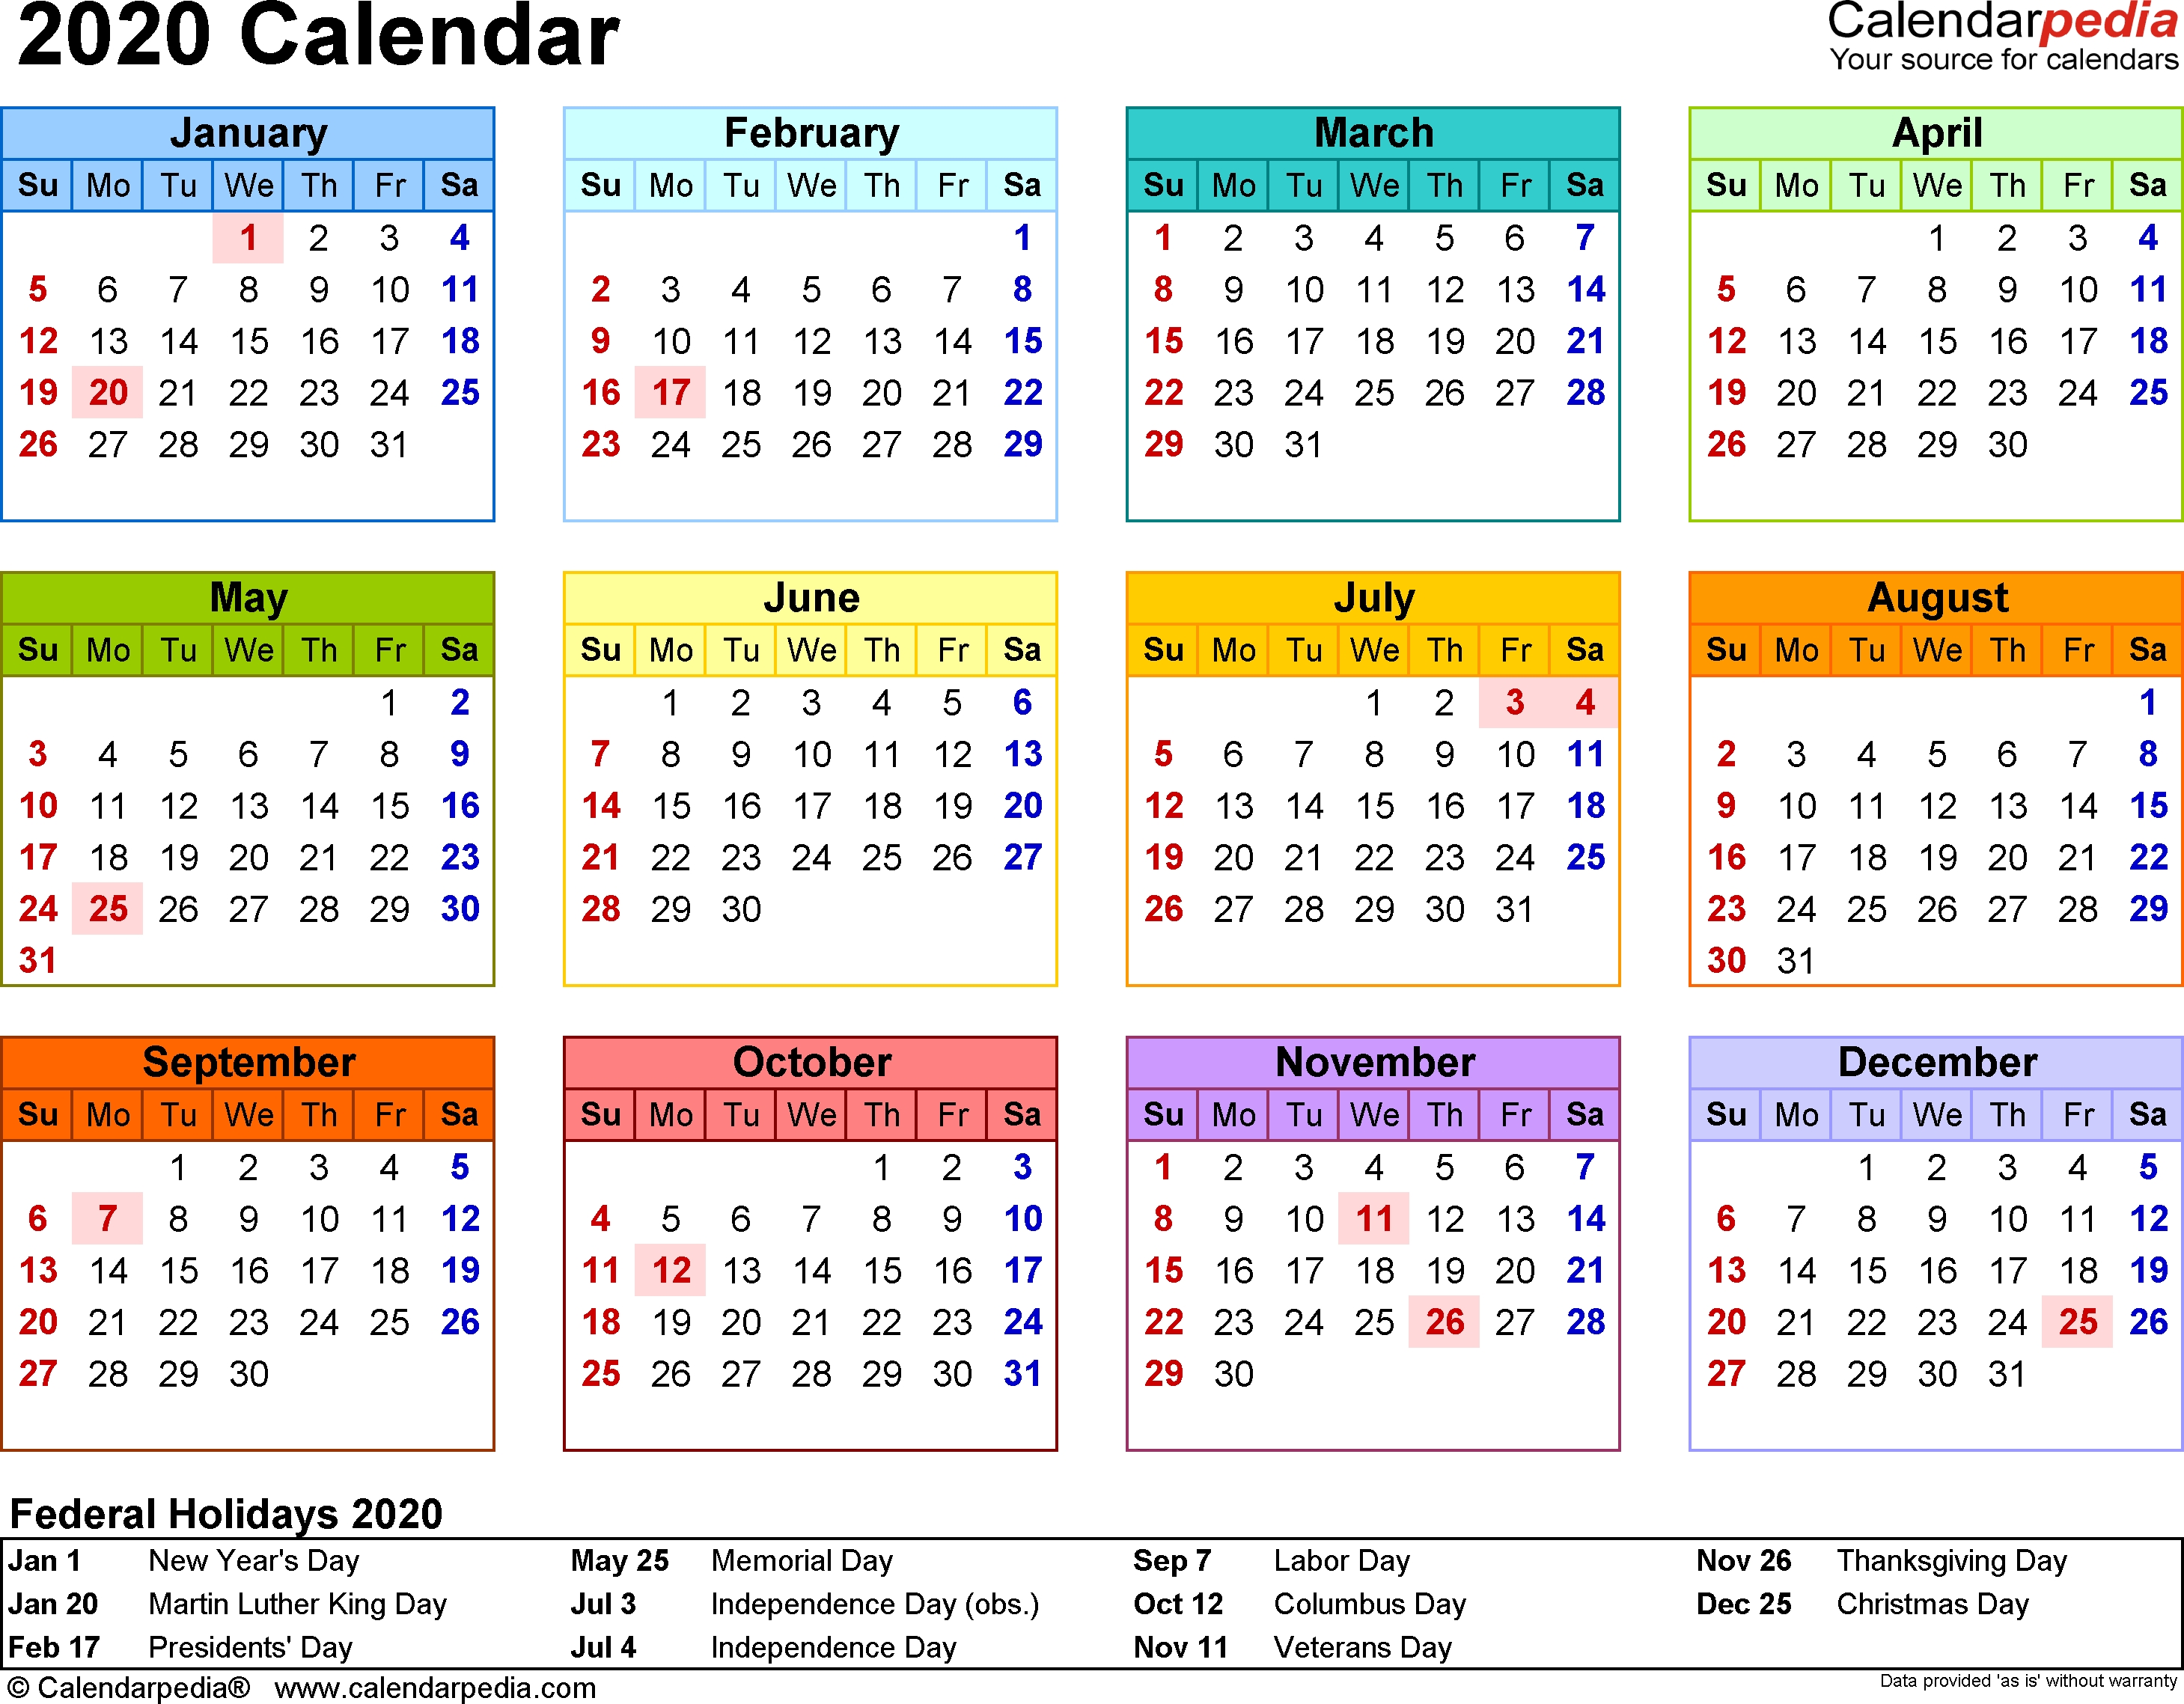 2020 Calendar - Free Printable Microsoft Word Templates throughout What Is 4-4-5 2020 Calendar